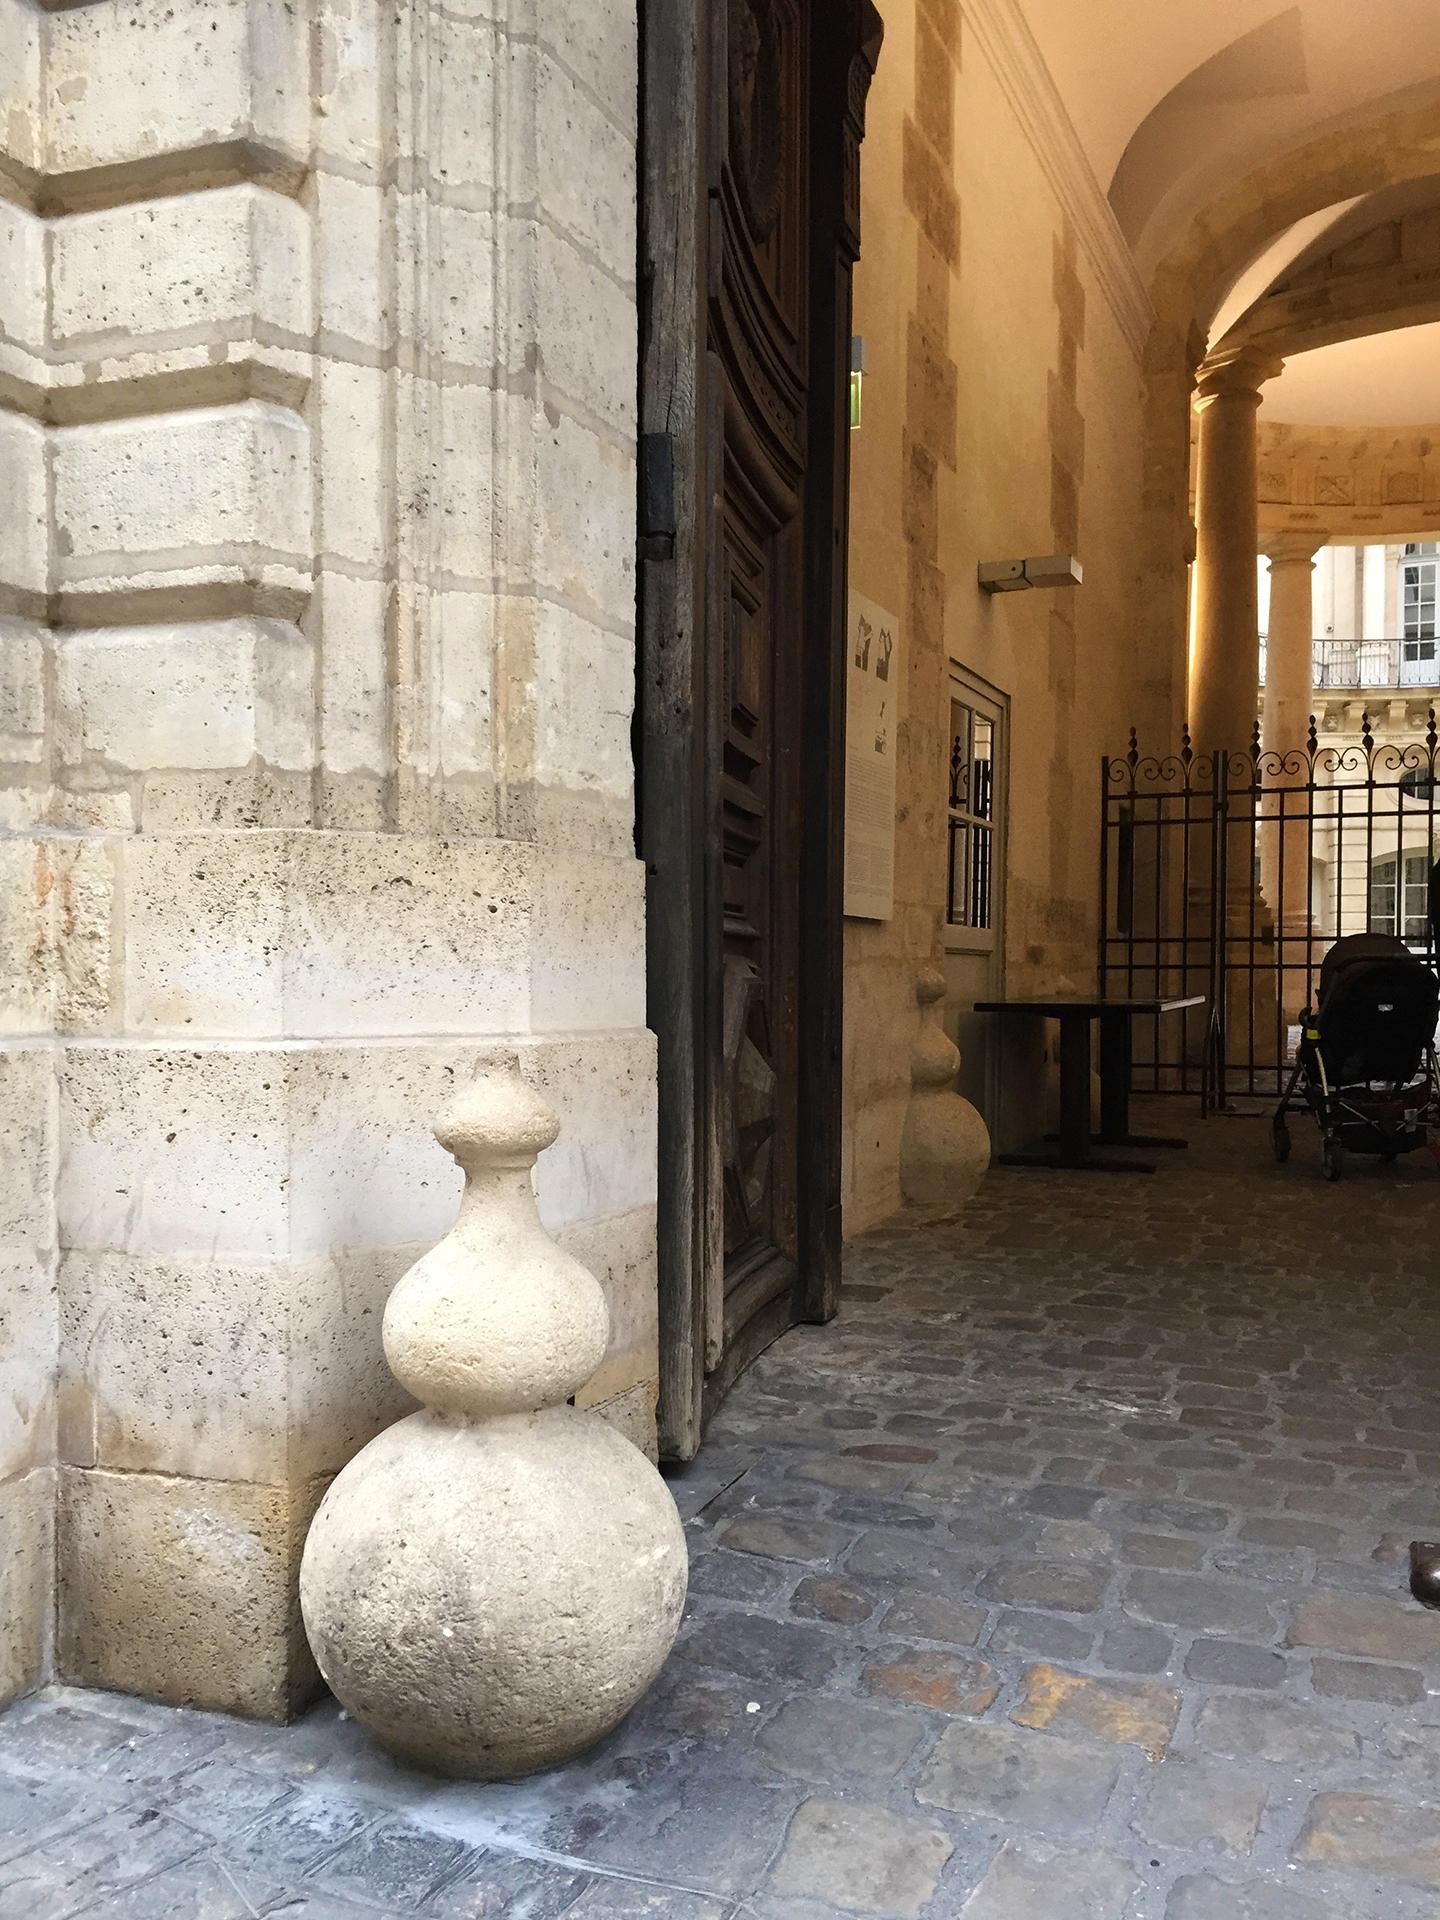 A fancier stone chasse-roue on rue François Miron.